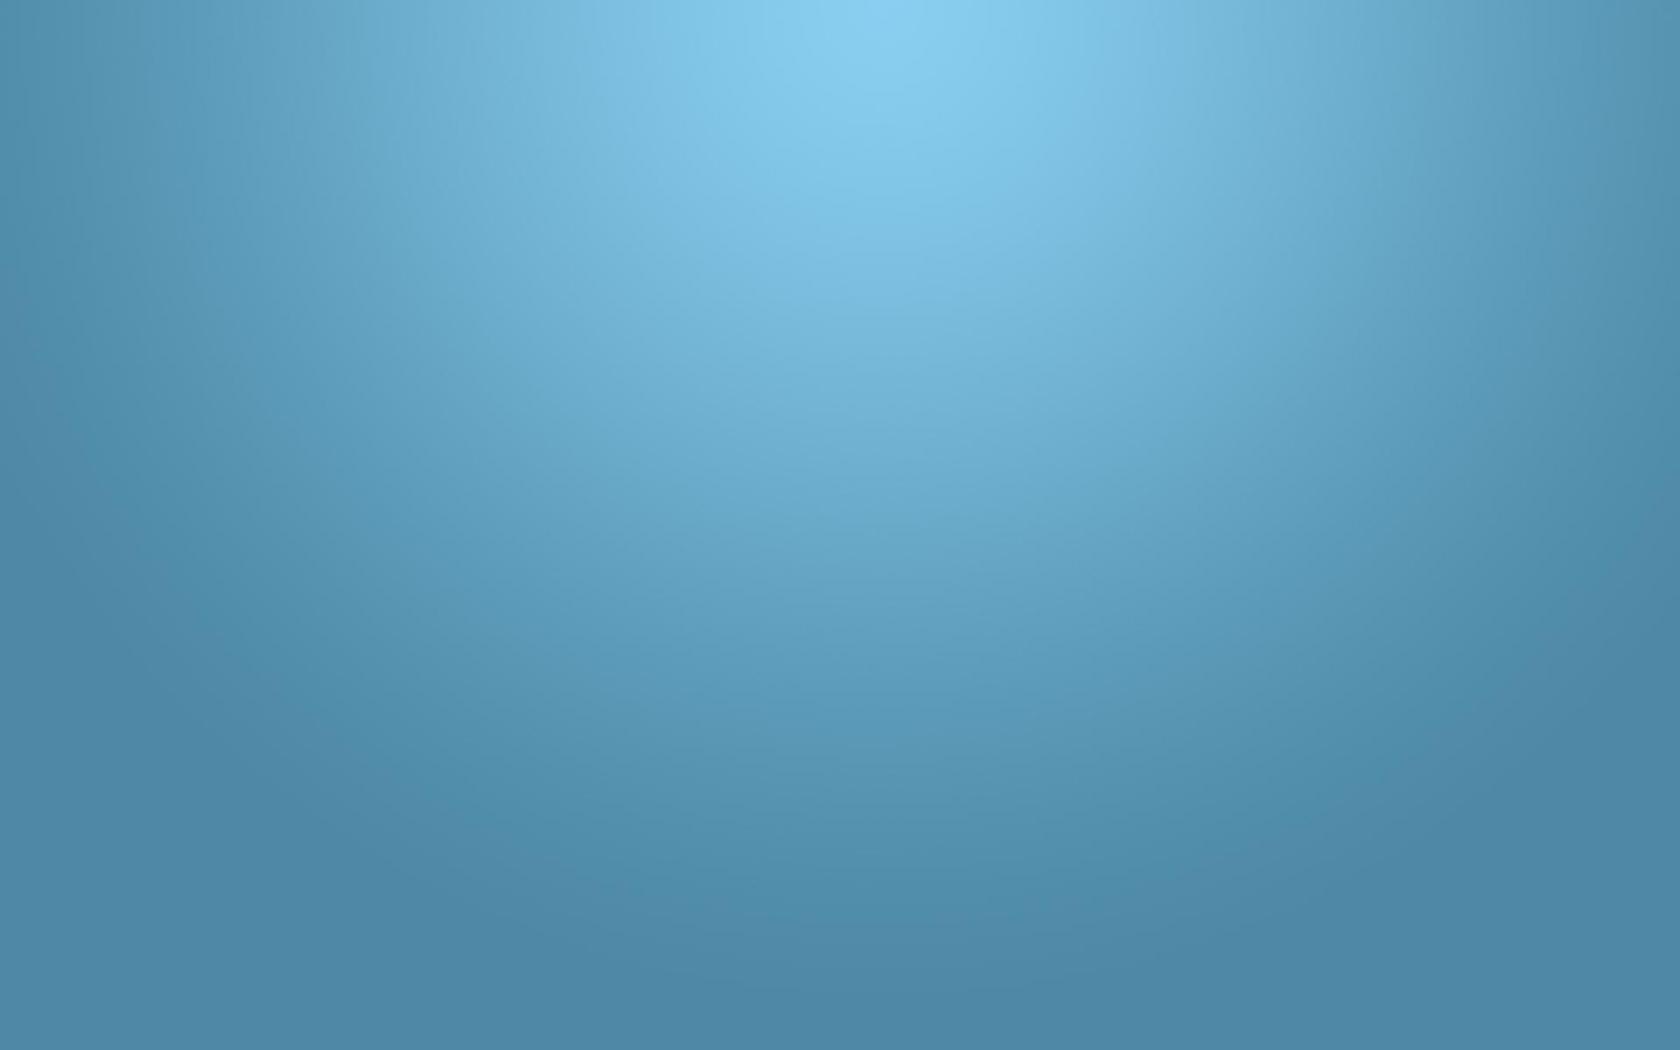 Desktop Backgrounds Using Browser Themes Desktop Wallpapers 1680x1050